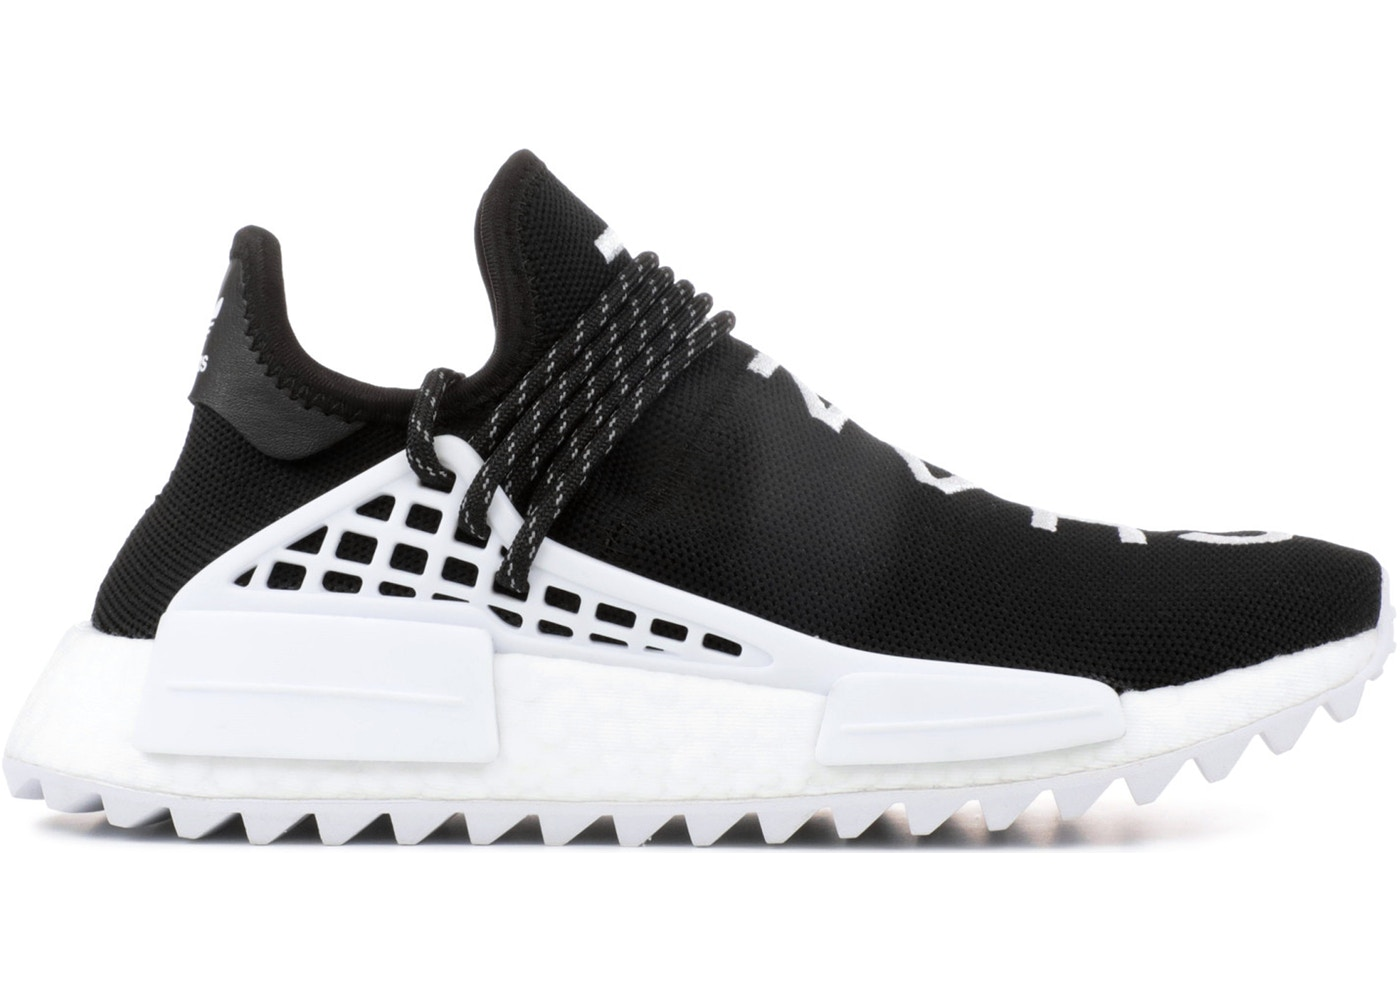 adidas Human Race NMD Pharrell x Chanel コアブラック/ランニングホワイト